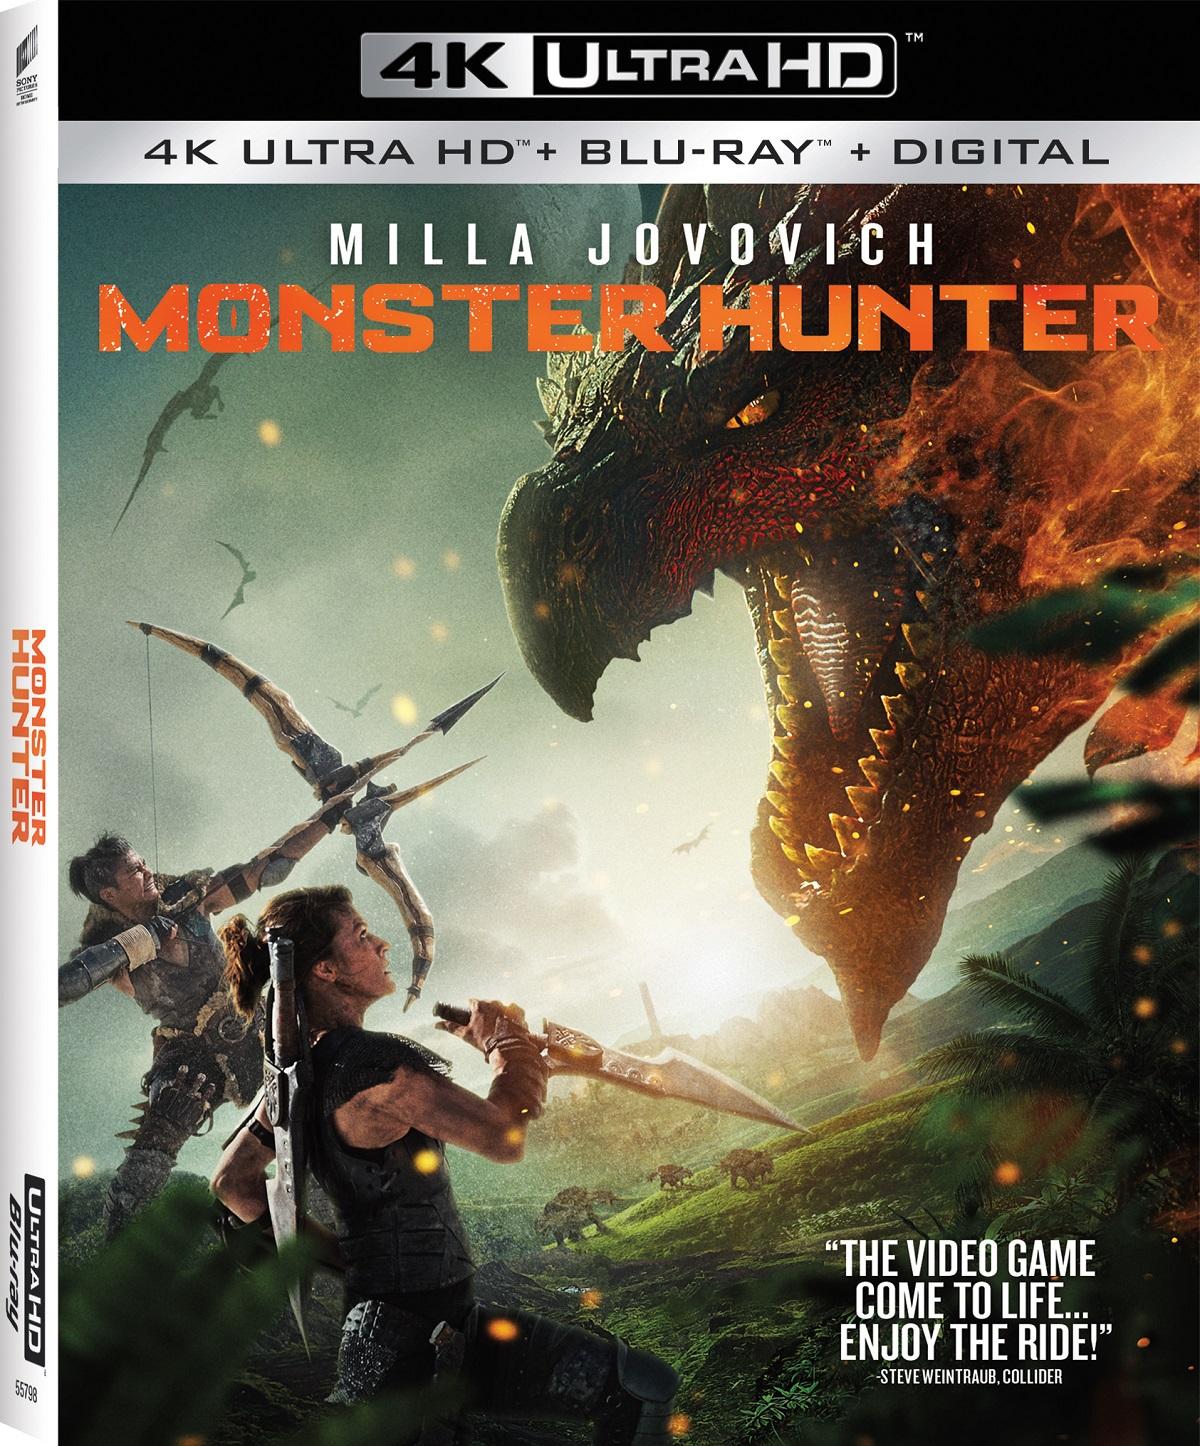 Monster Hunter Digital Feb 16 4k Uhd Blu Ray Dvd March 2 2021